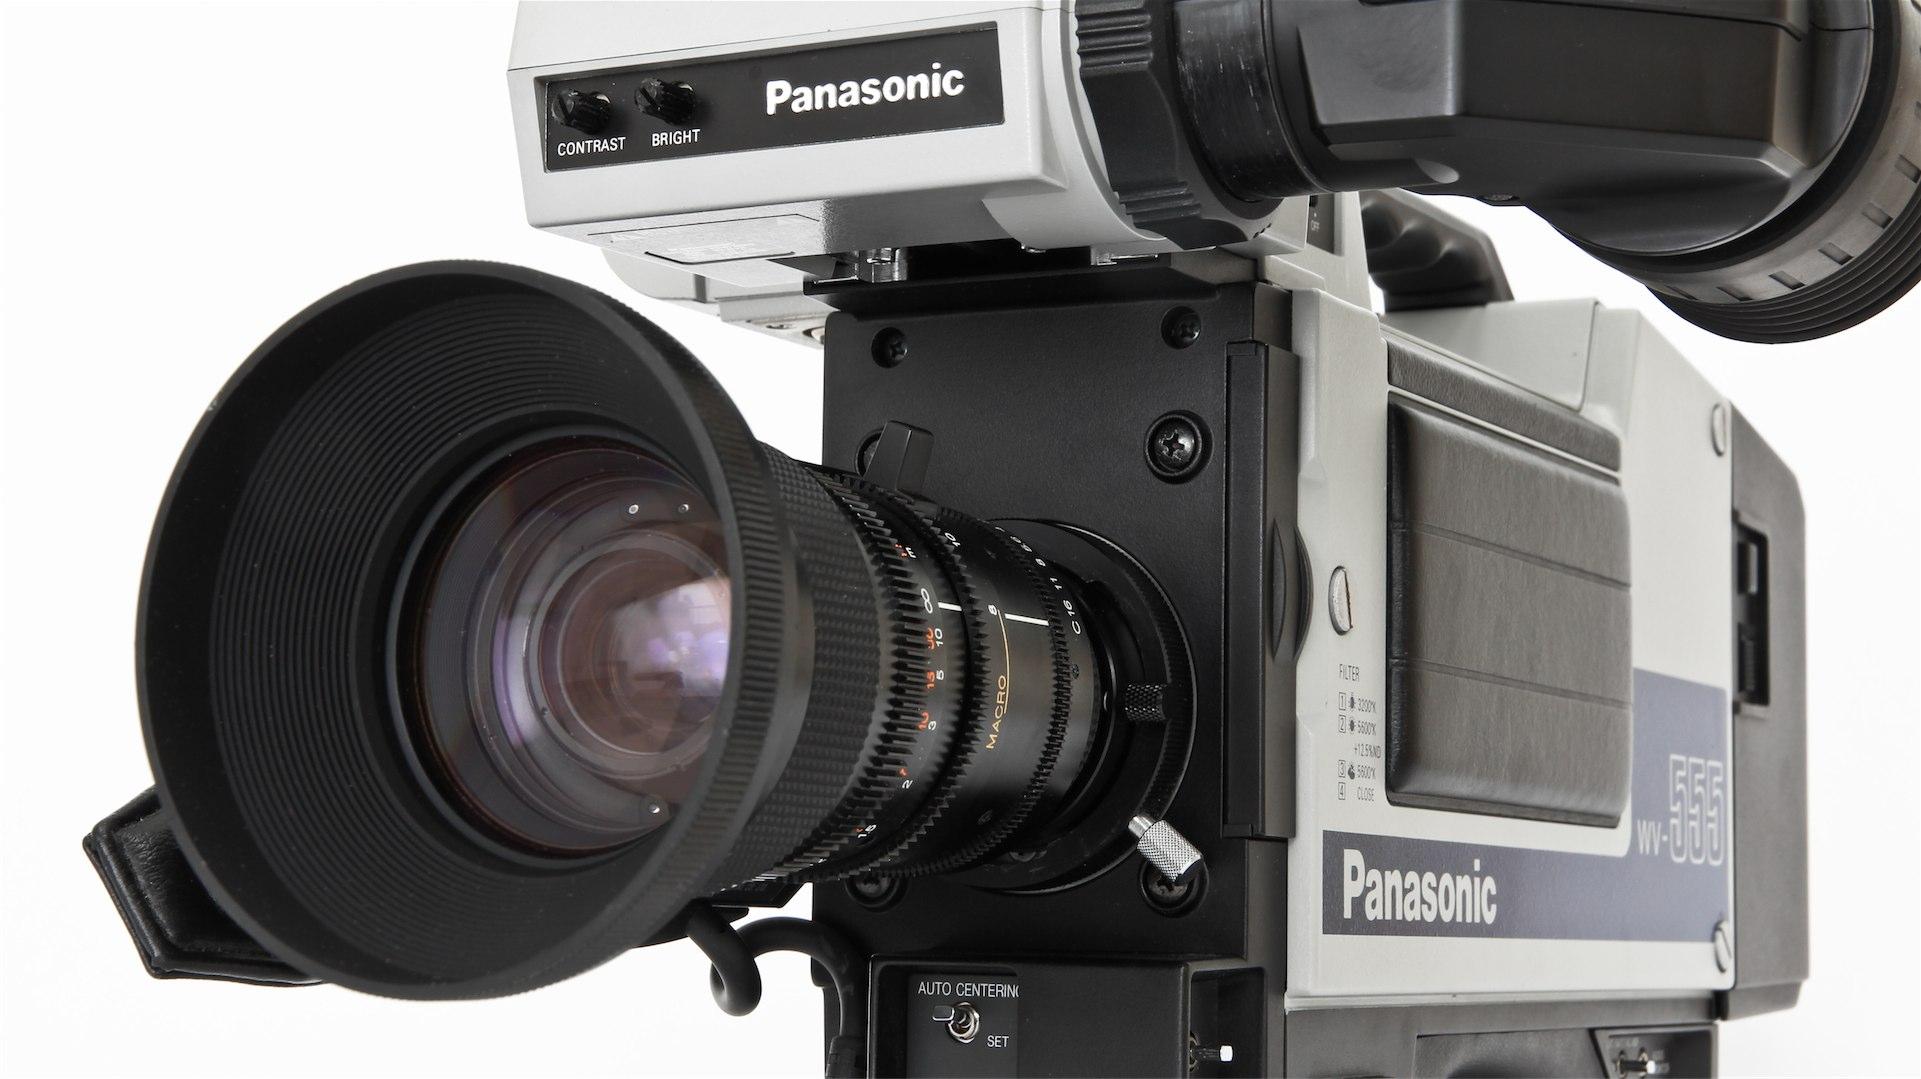 Panasonic WV-555 -  (16 von 19)_1